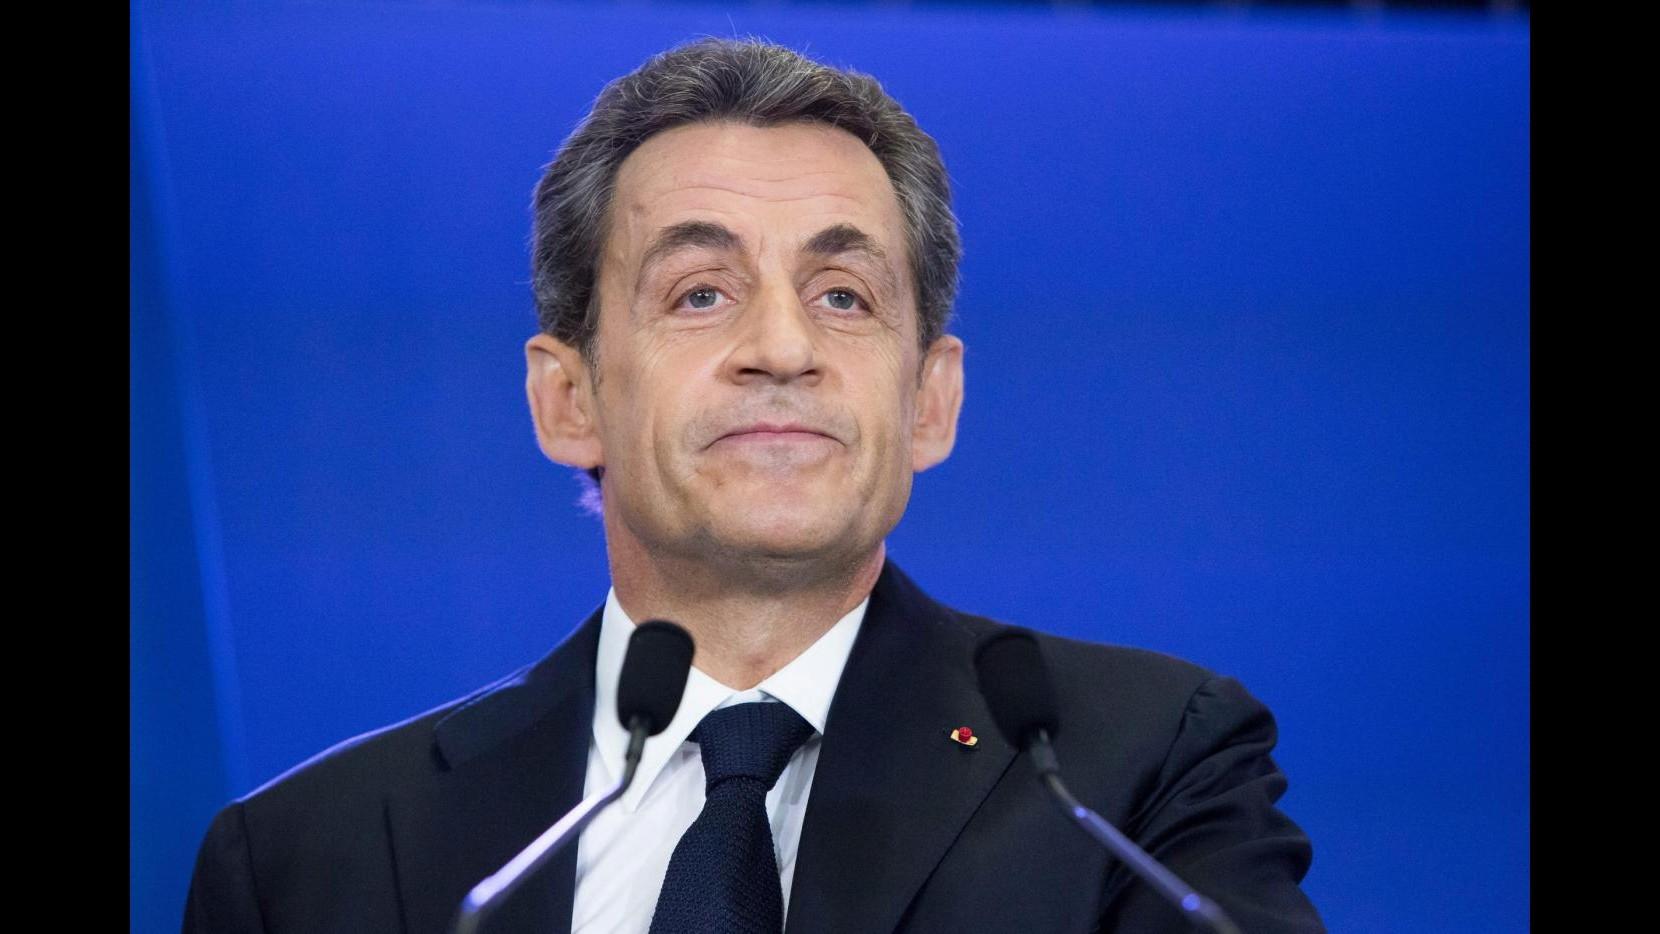 Francia, Ump di Sarkozy cambia nome: da ora 'Les Republicaines'